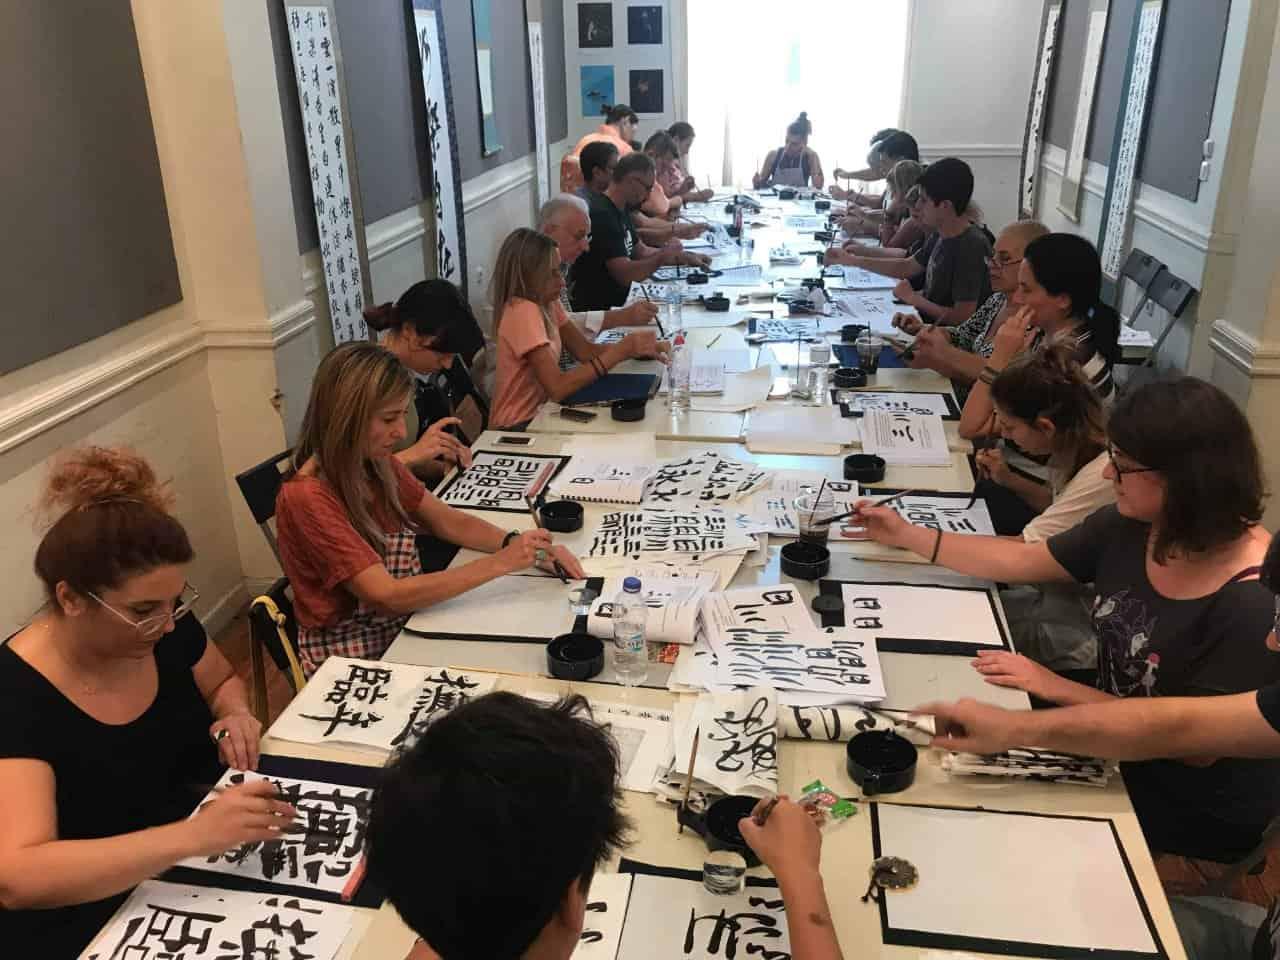 20190916010727 p - ギリシャでの書道教室 Calligraphy workshop in Greece